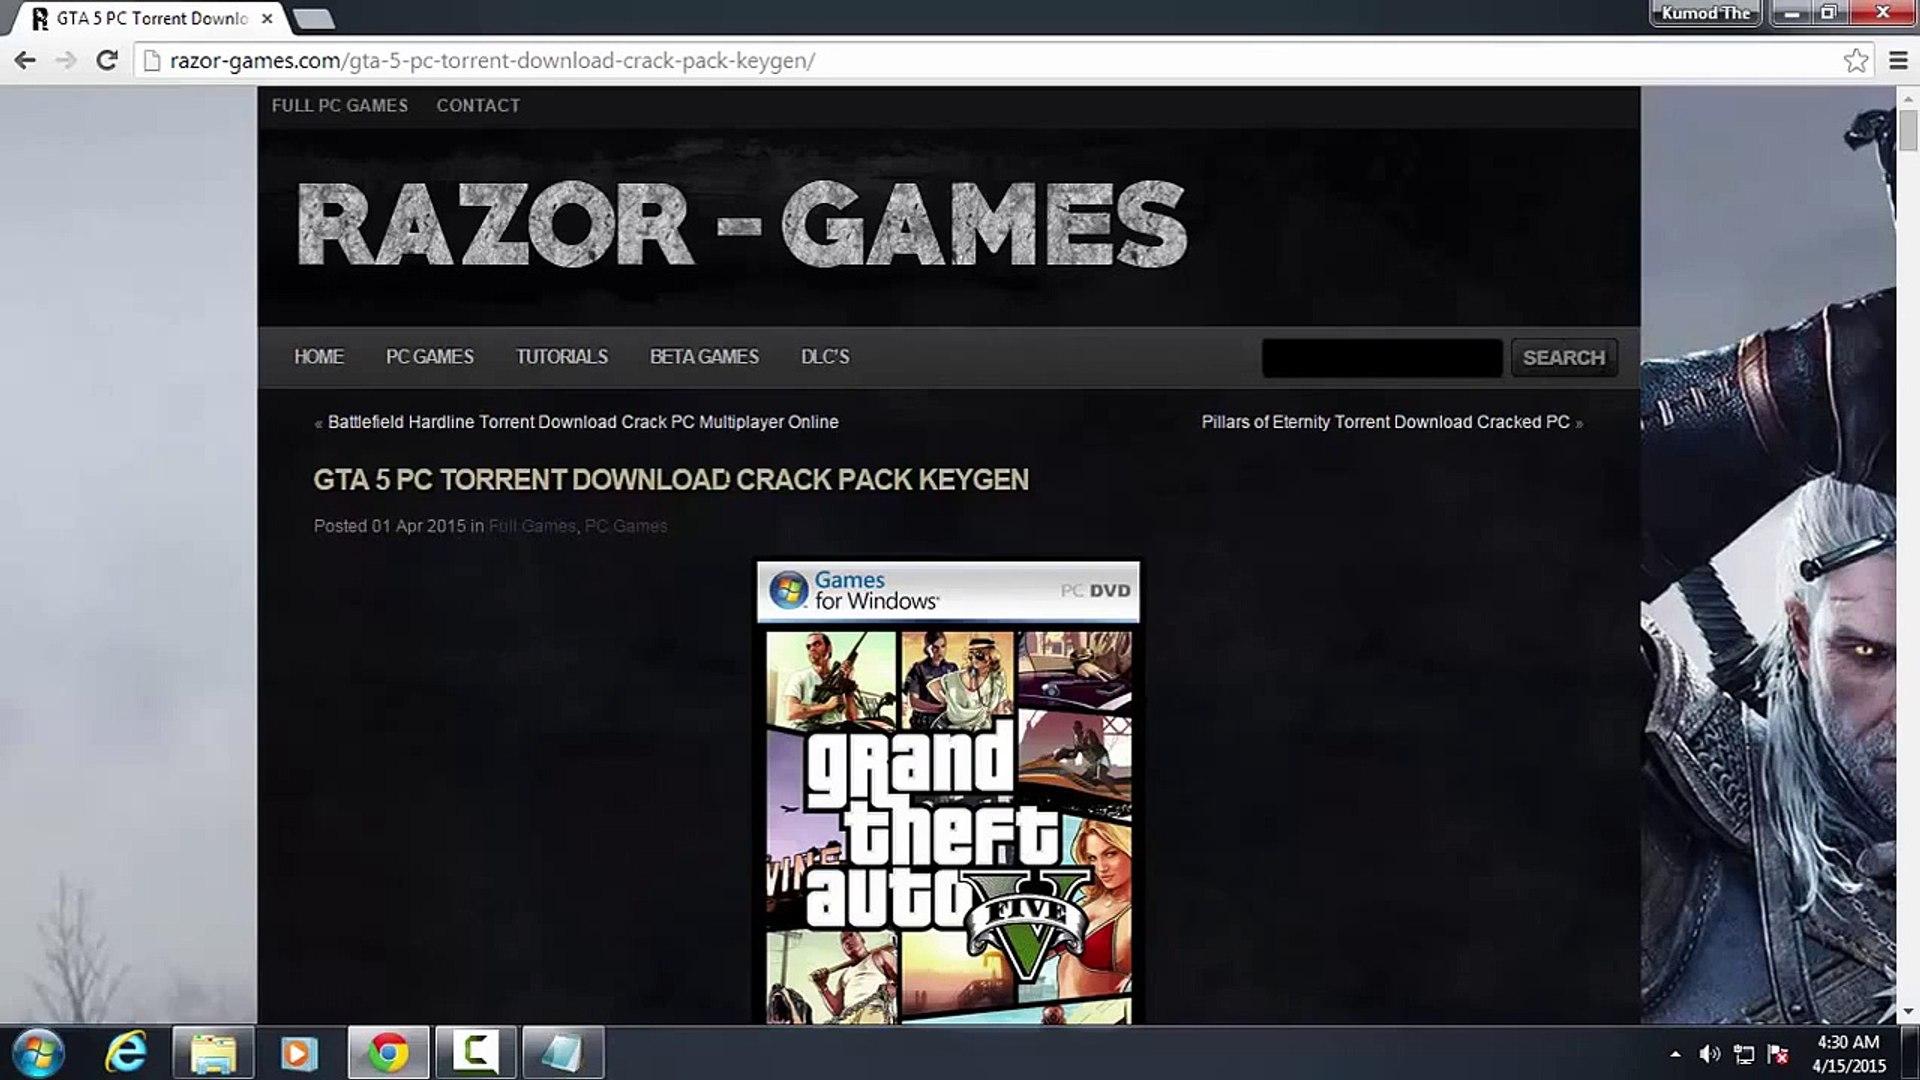 GTA 5 PC Crack Download Razor